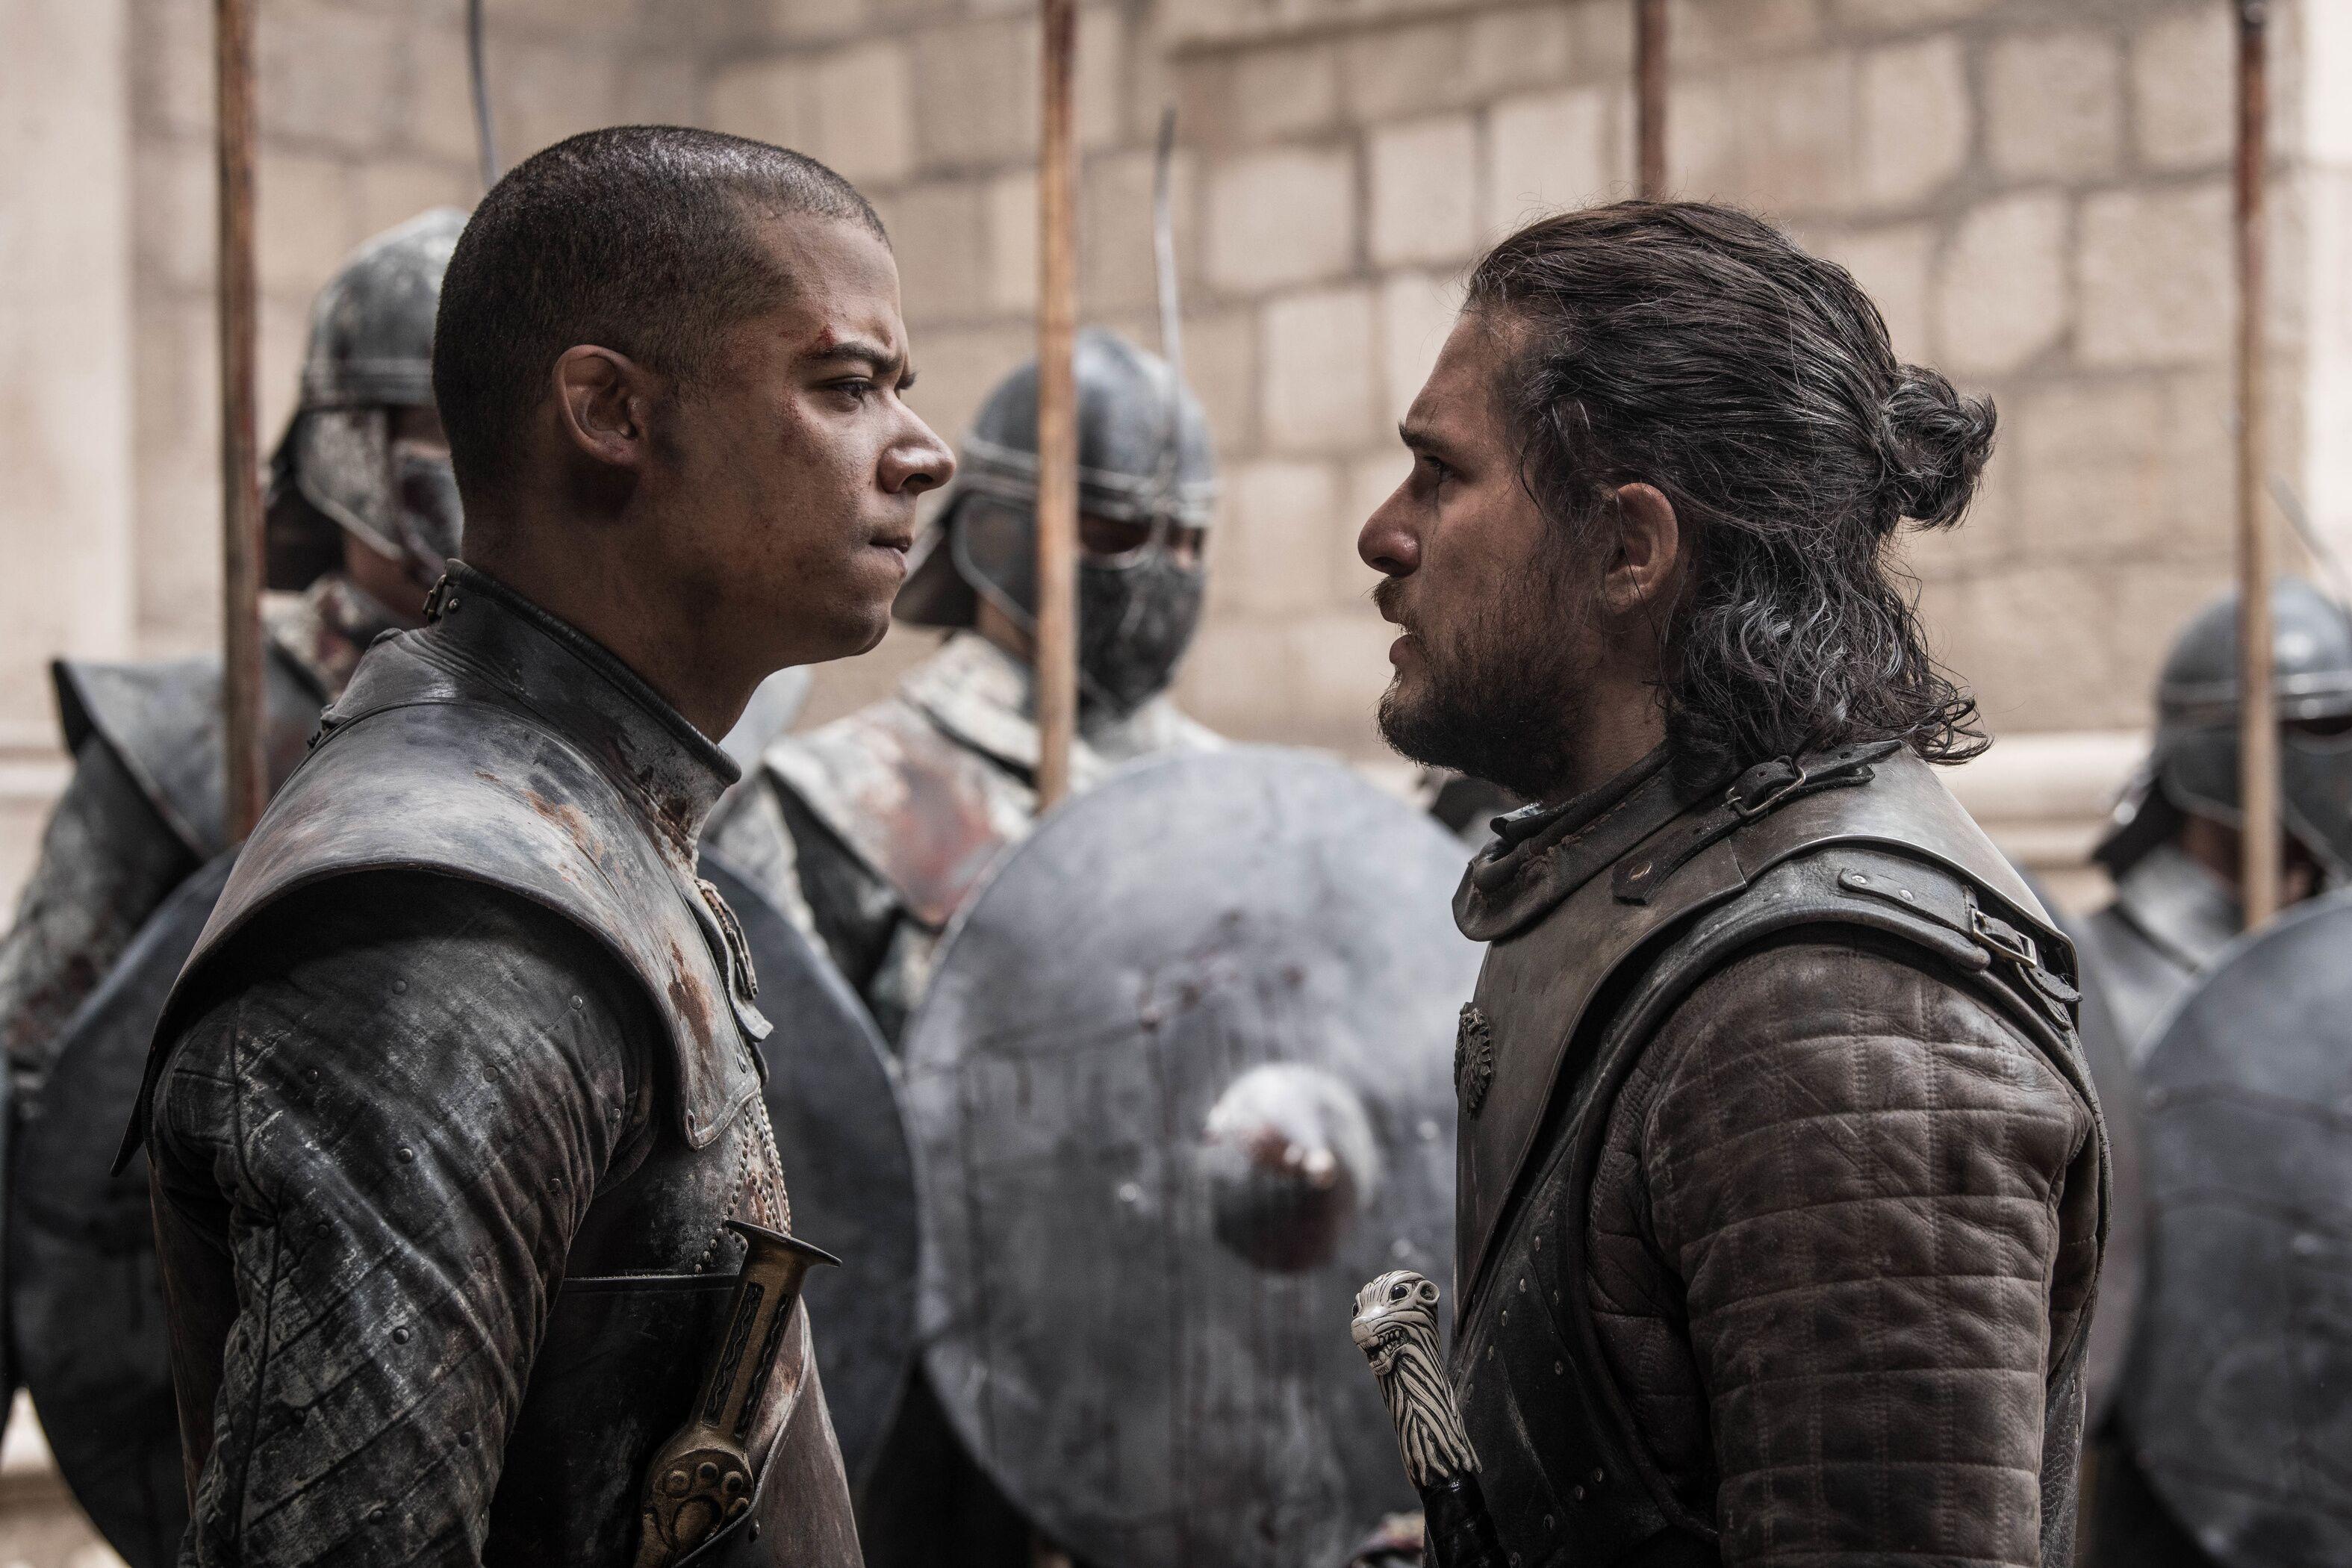 Jacob Anderson (Grey Worm) thinks Jon Snow got off too lightly